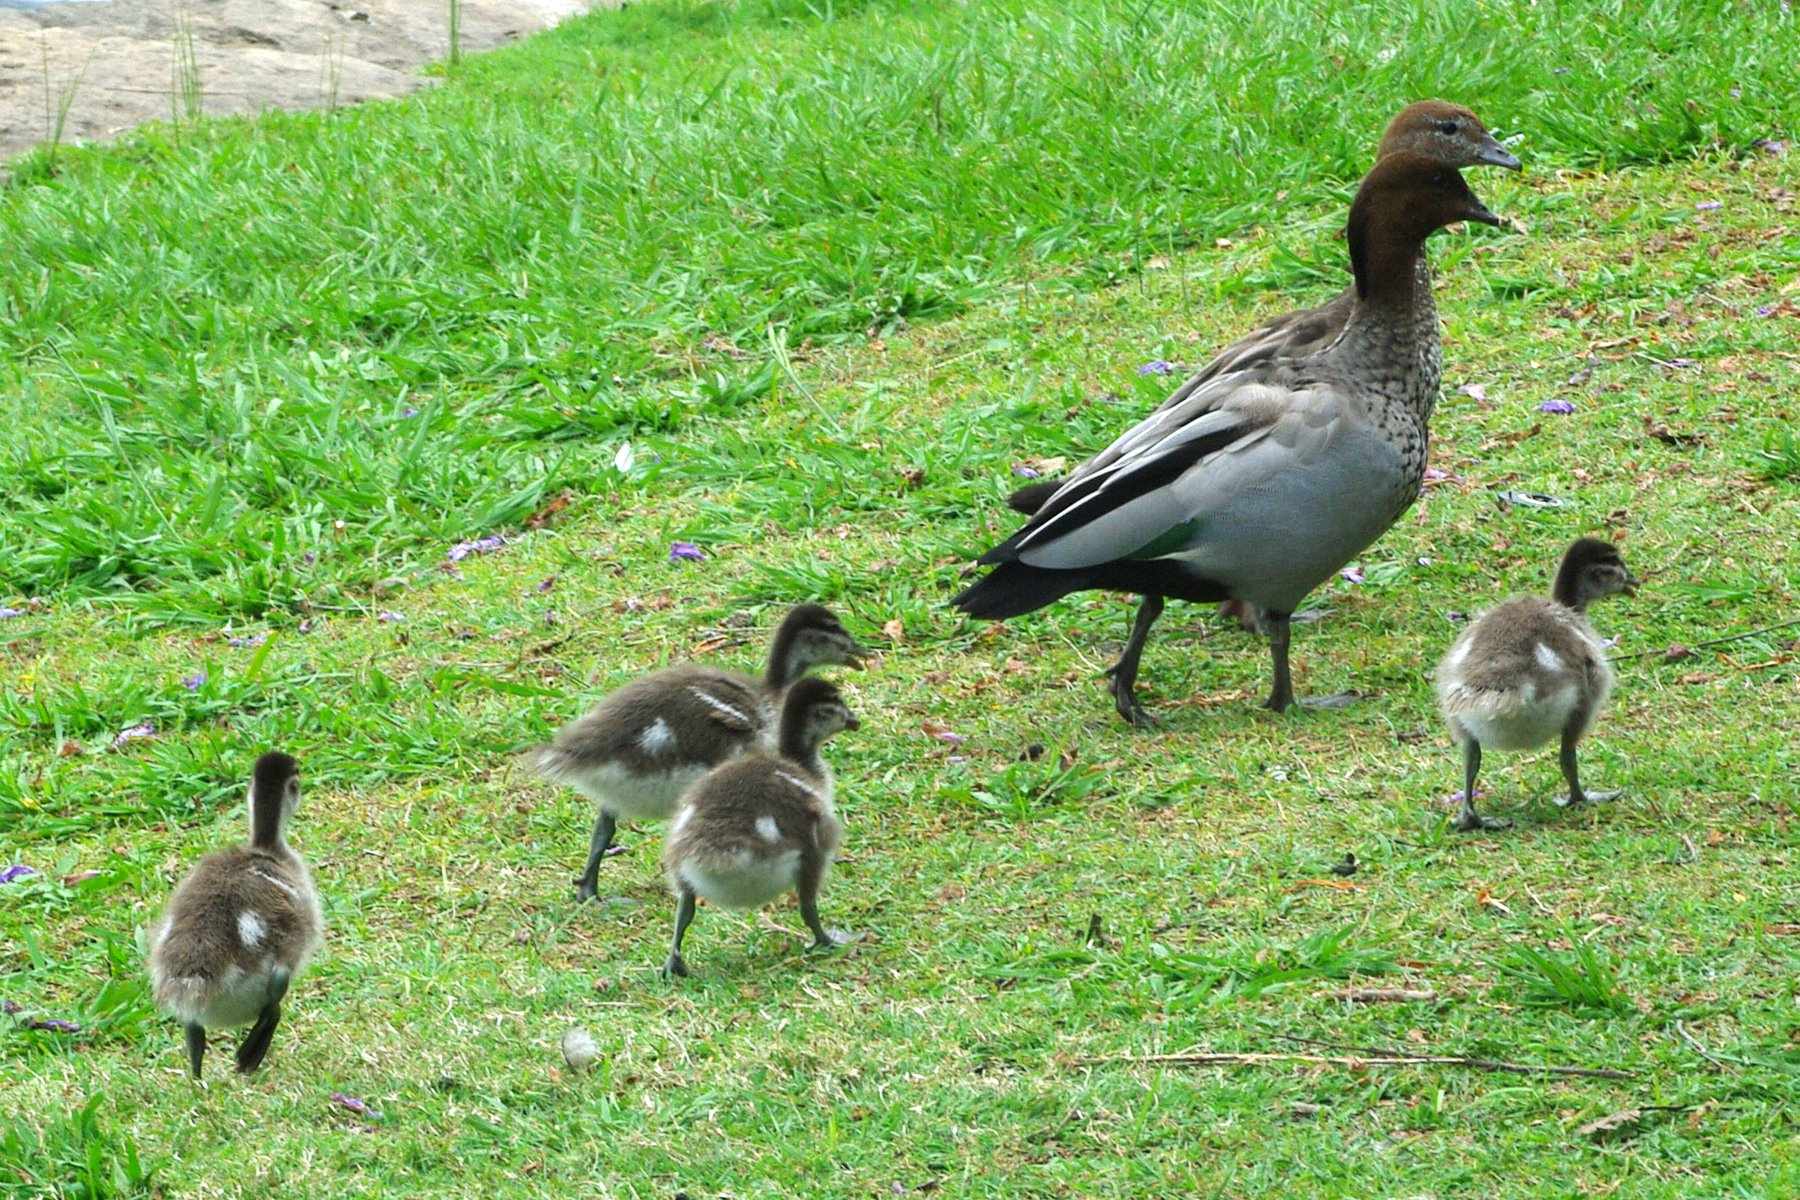 A family of Australian Wood Ducks in Australia.